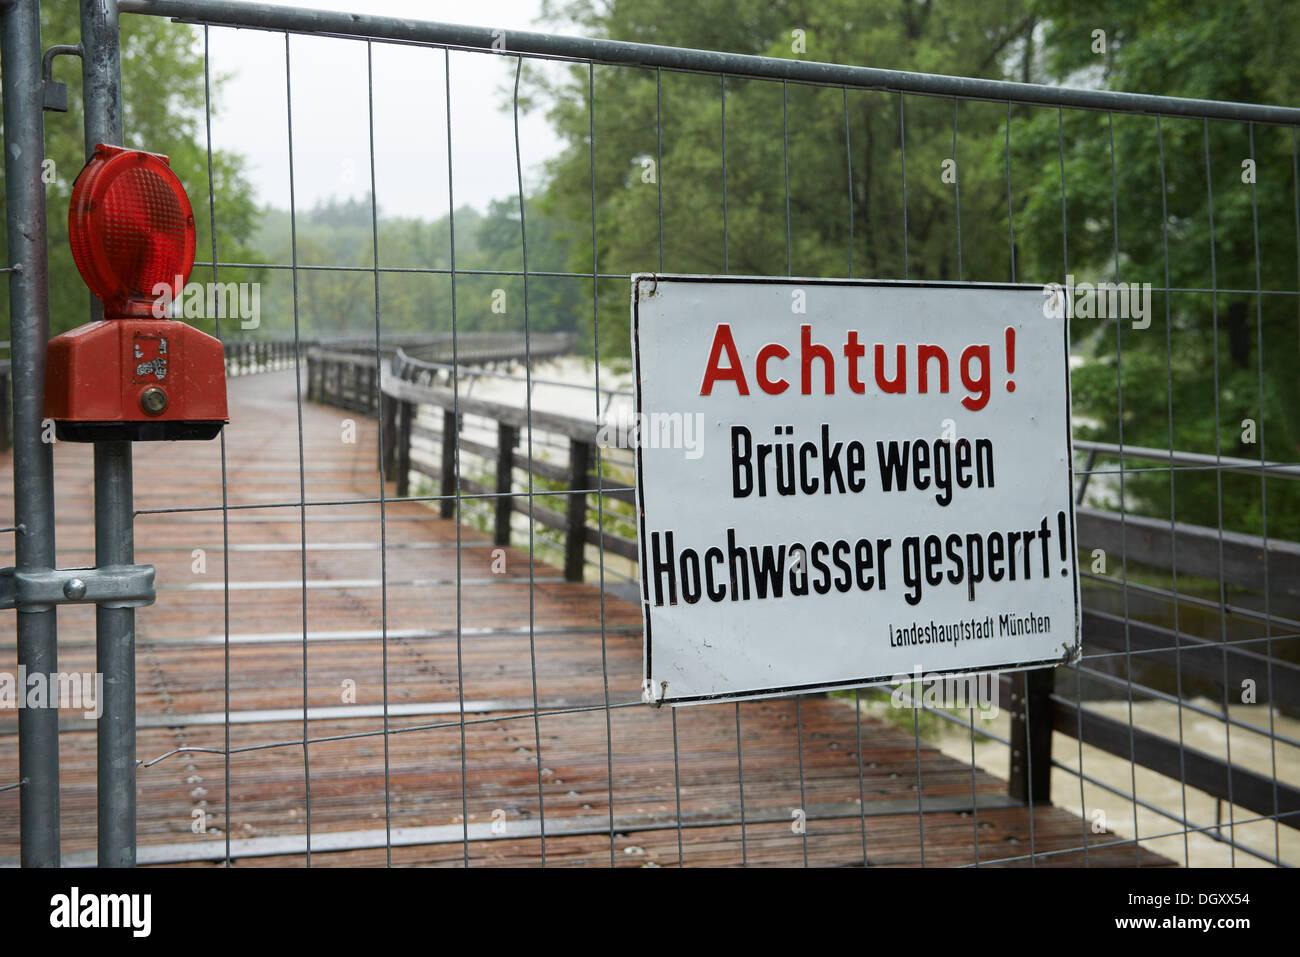 Barrier with a warning sign, 'Achtung! Brücke wegen Hochwasser gesperrt!', German for 'Attention! Bridge closed due to - Stock Image